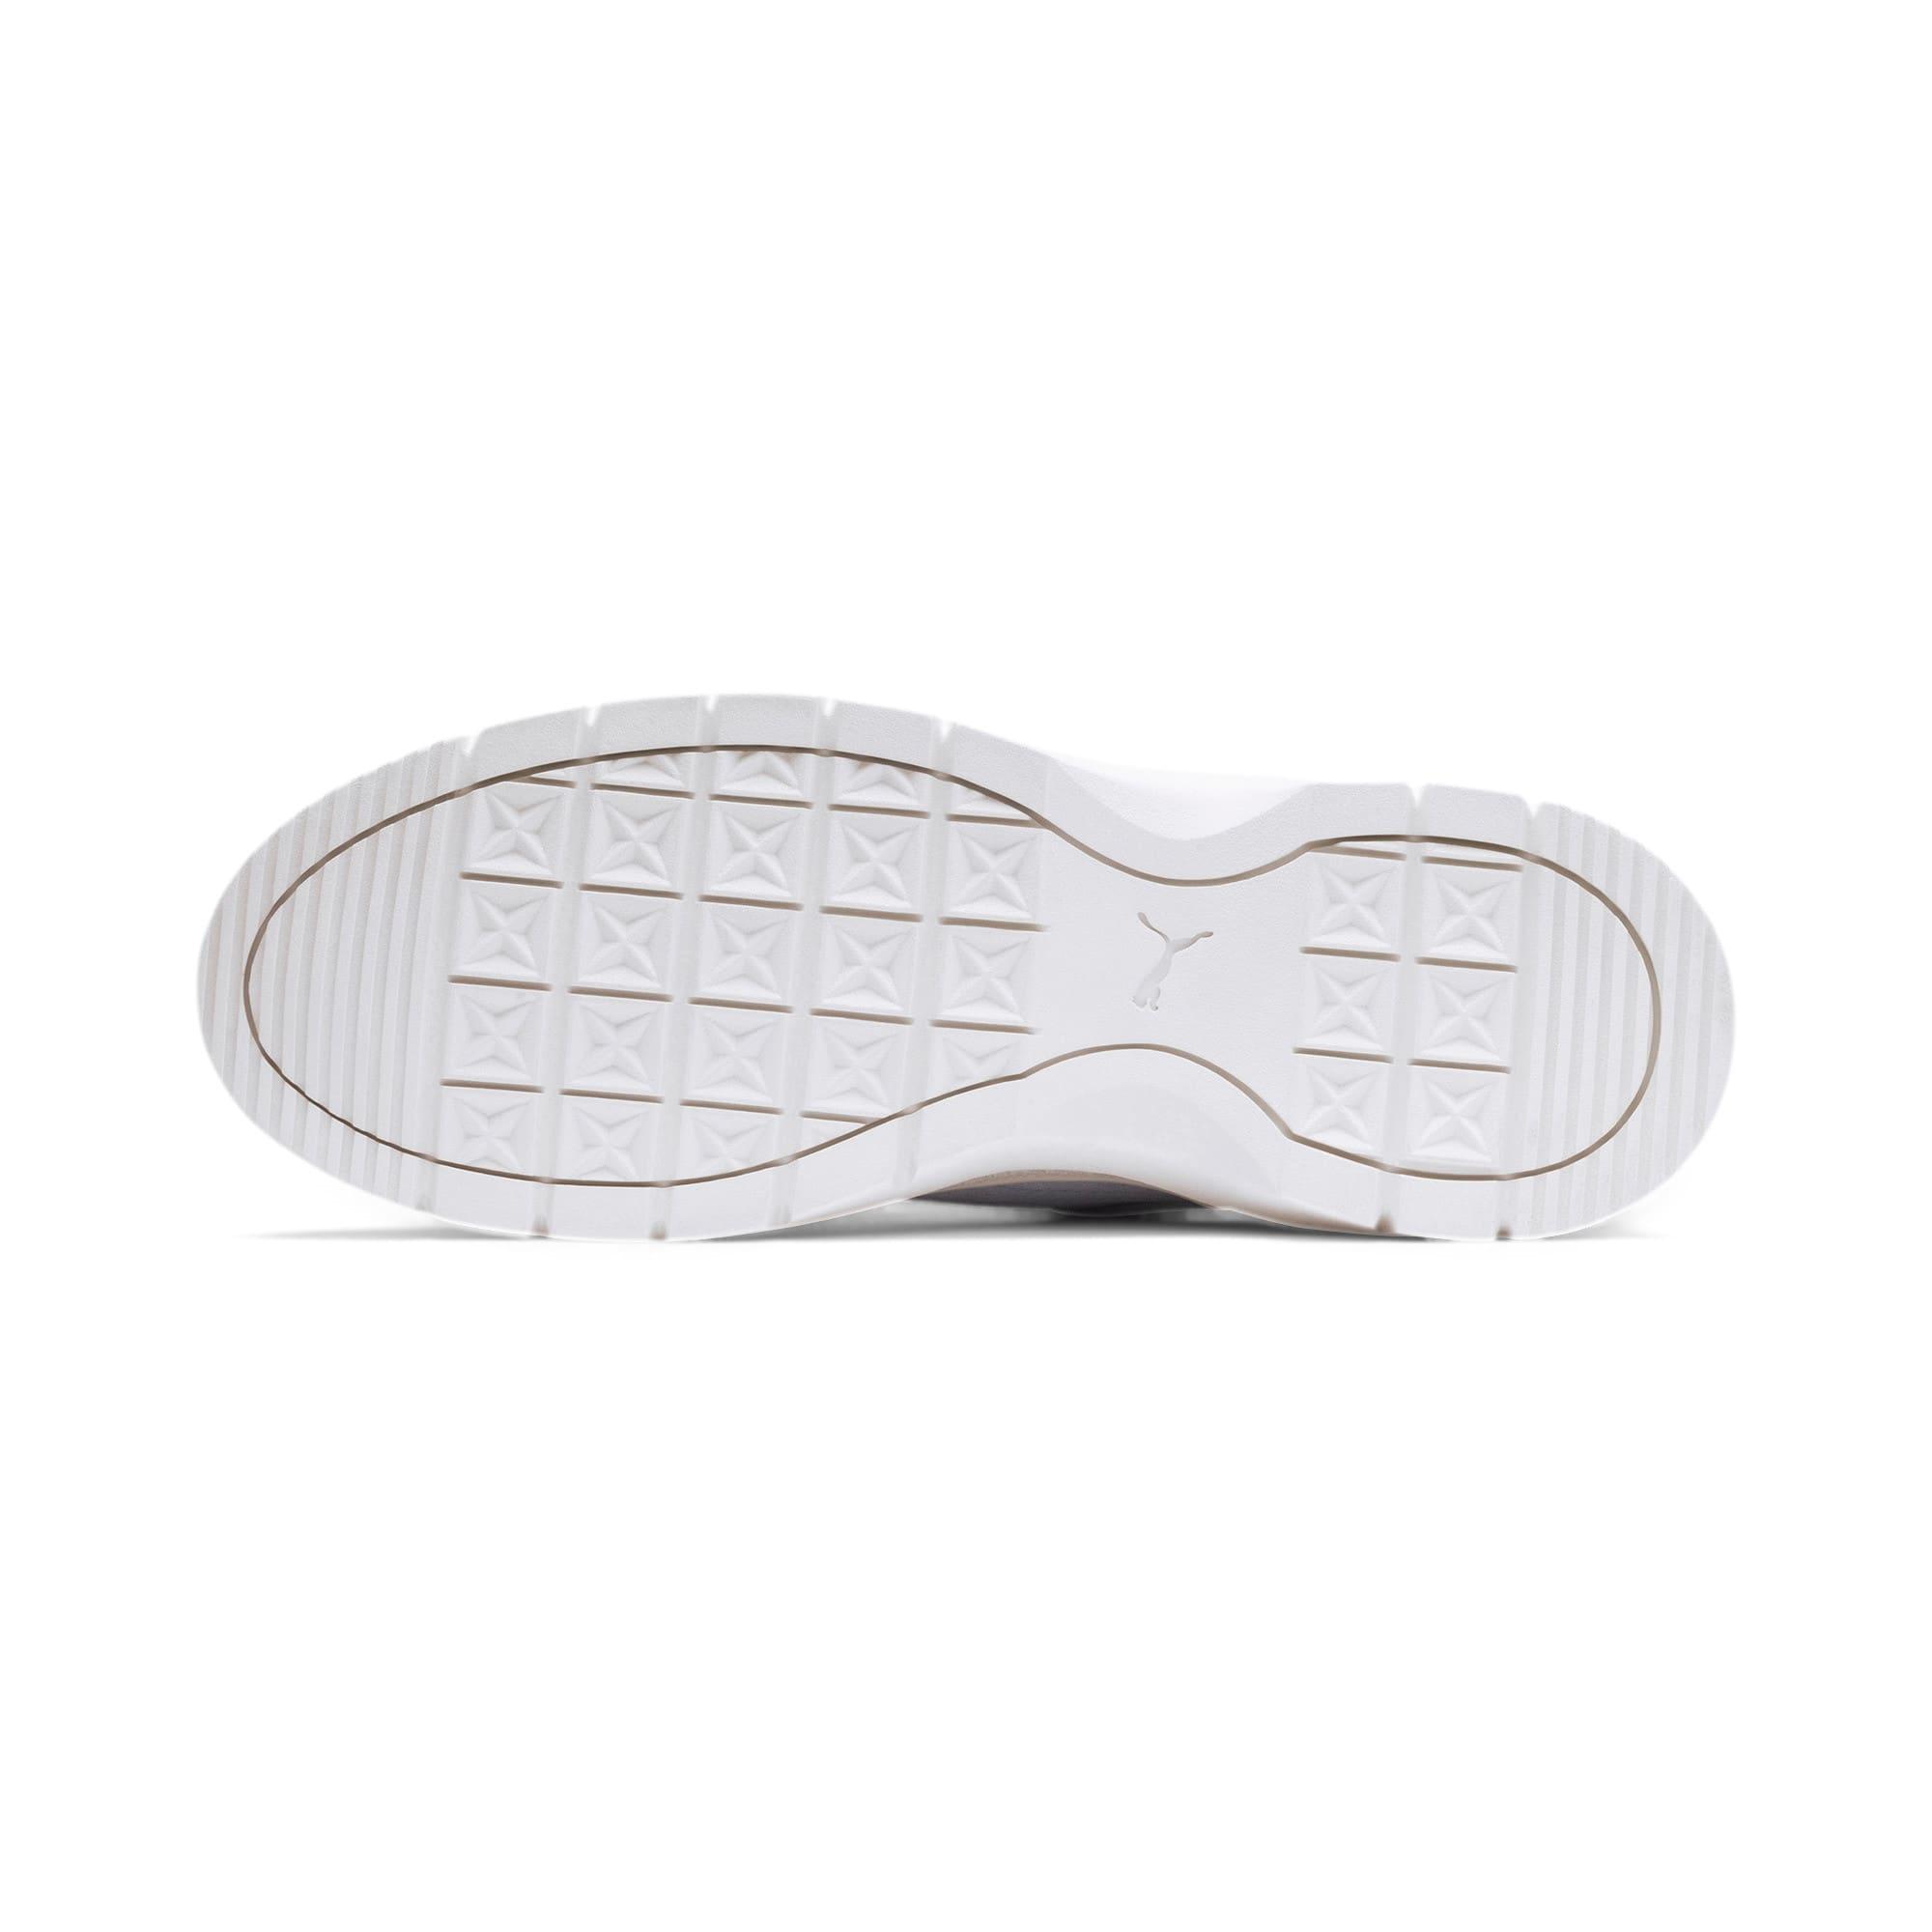 Thumbnail 5 of Utility Suede Women's Sneakers, Heather, medium